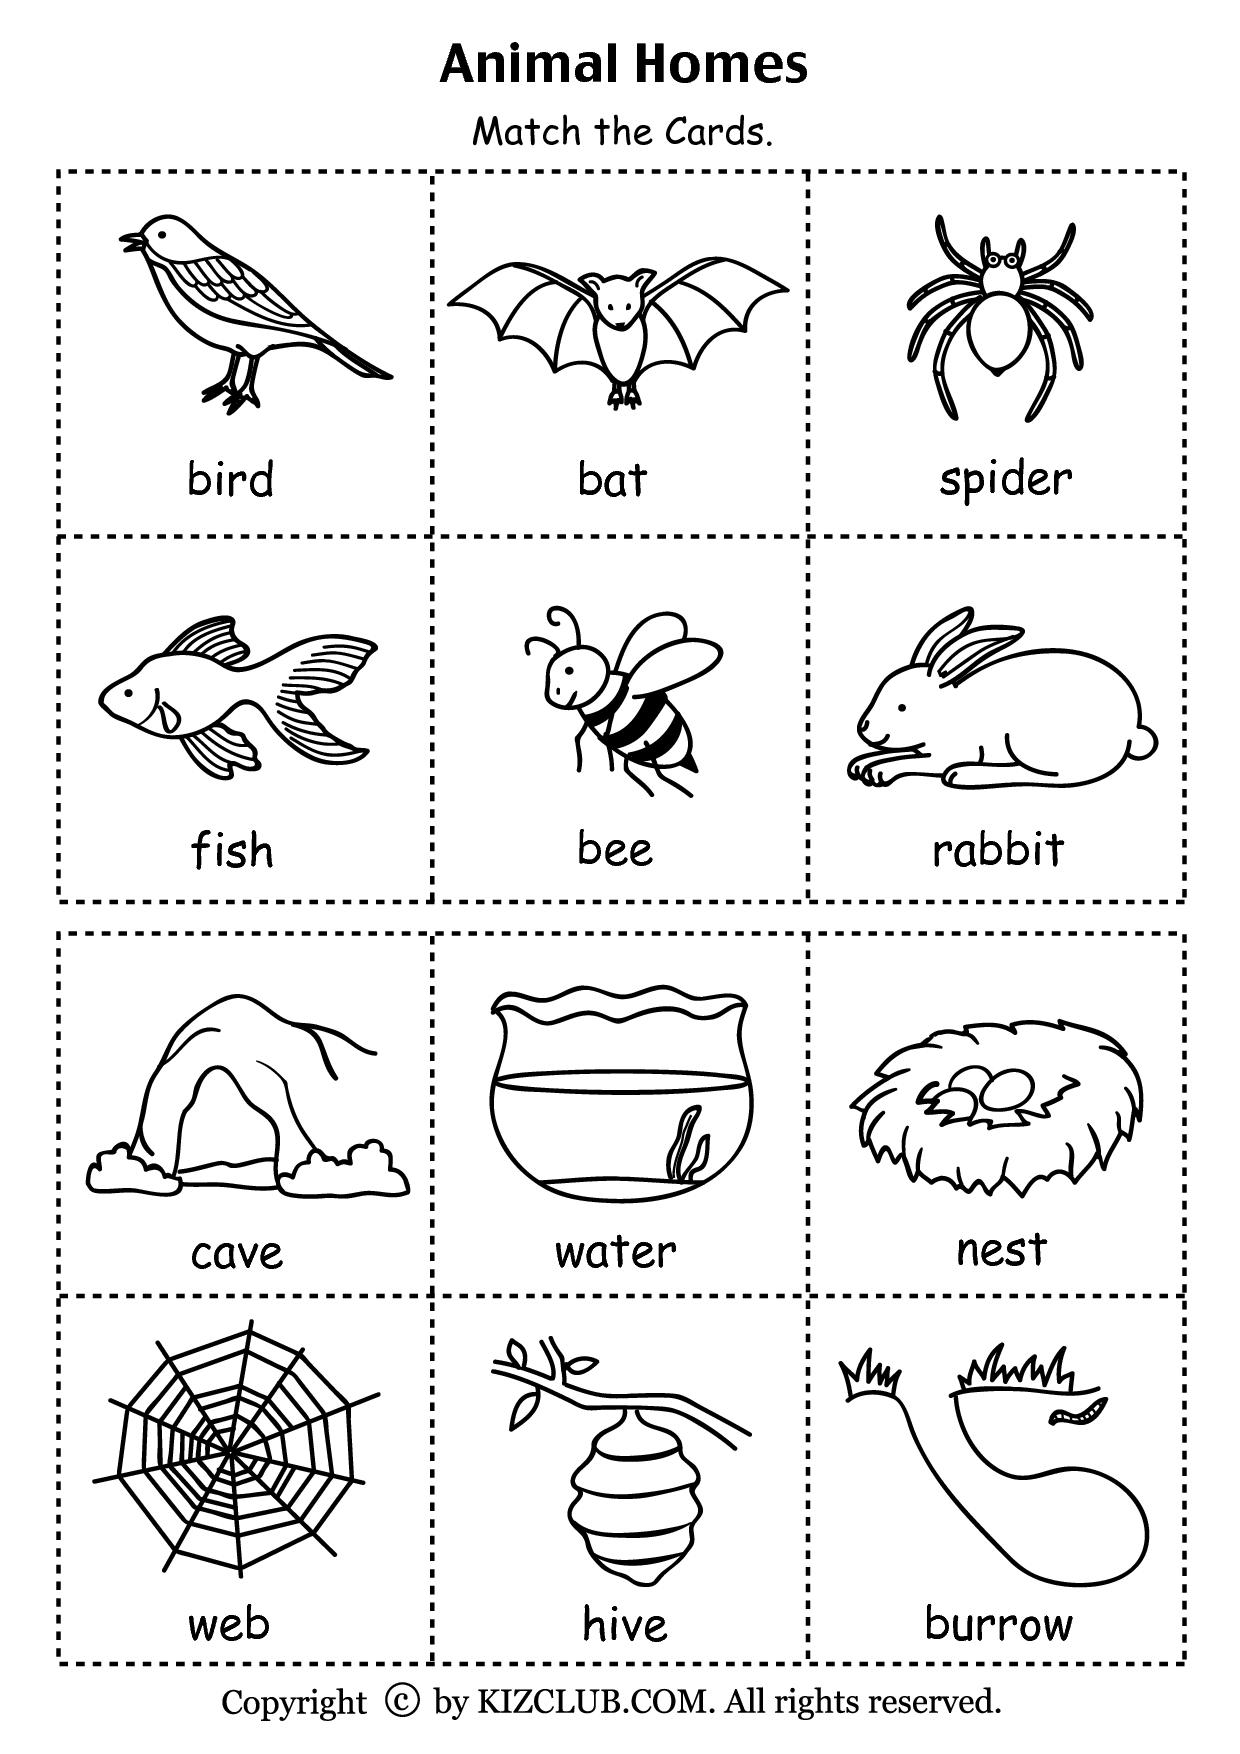 Animal Homes (Pdf) | Stuff To Buy | Pinterest | Animal Habitats - Free Printable Worksheets Animal Habitats